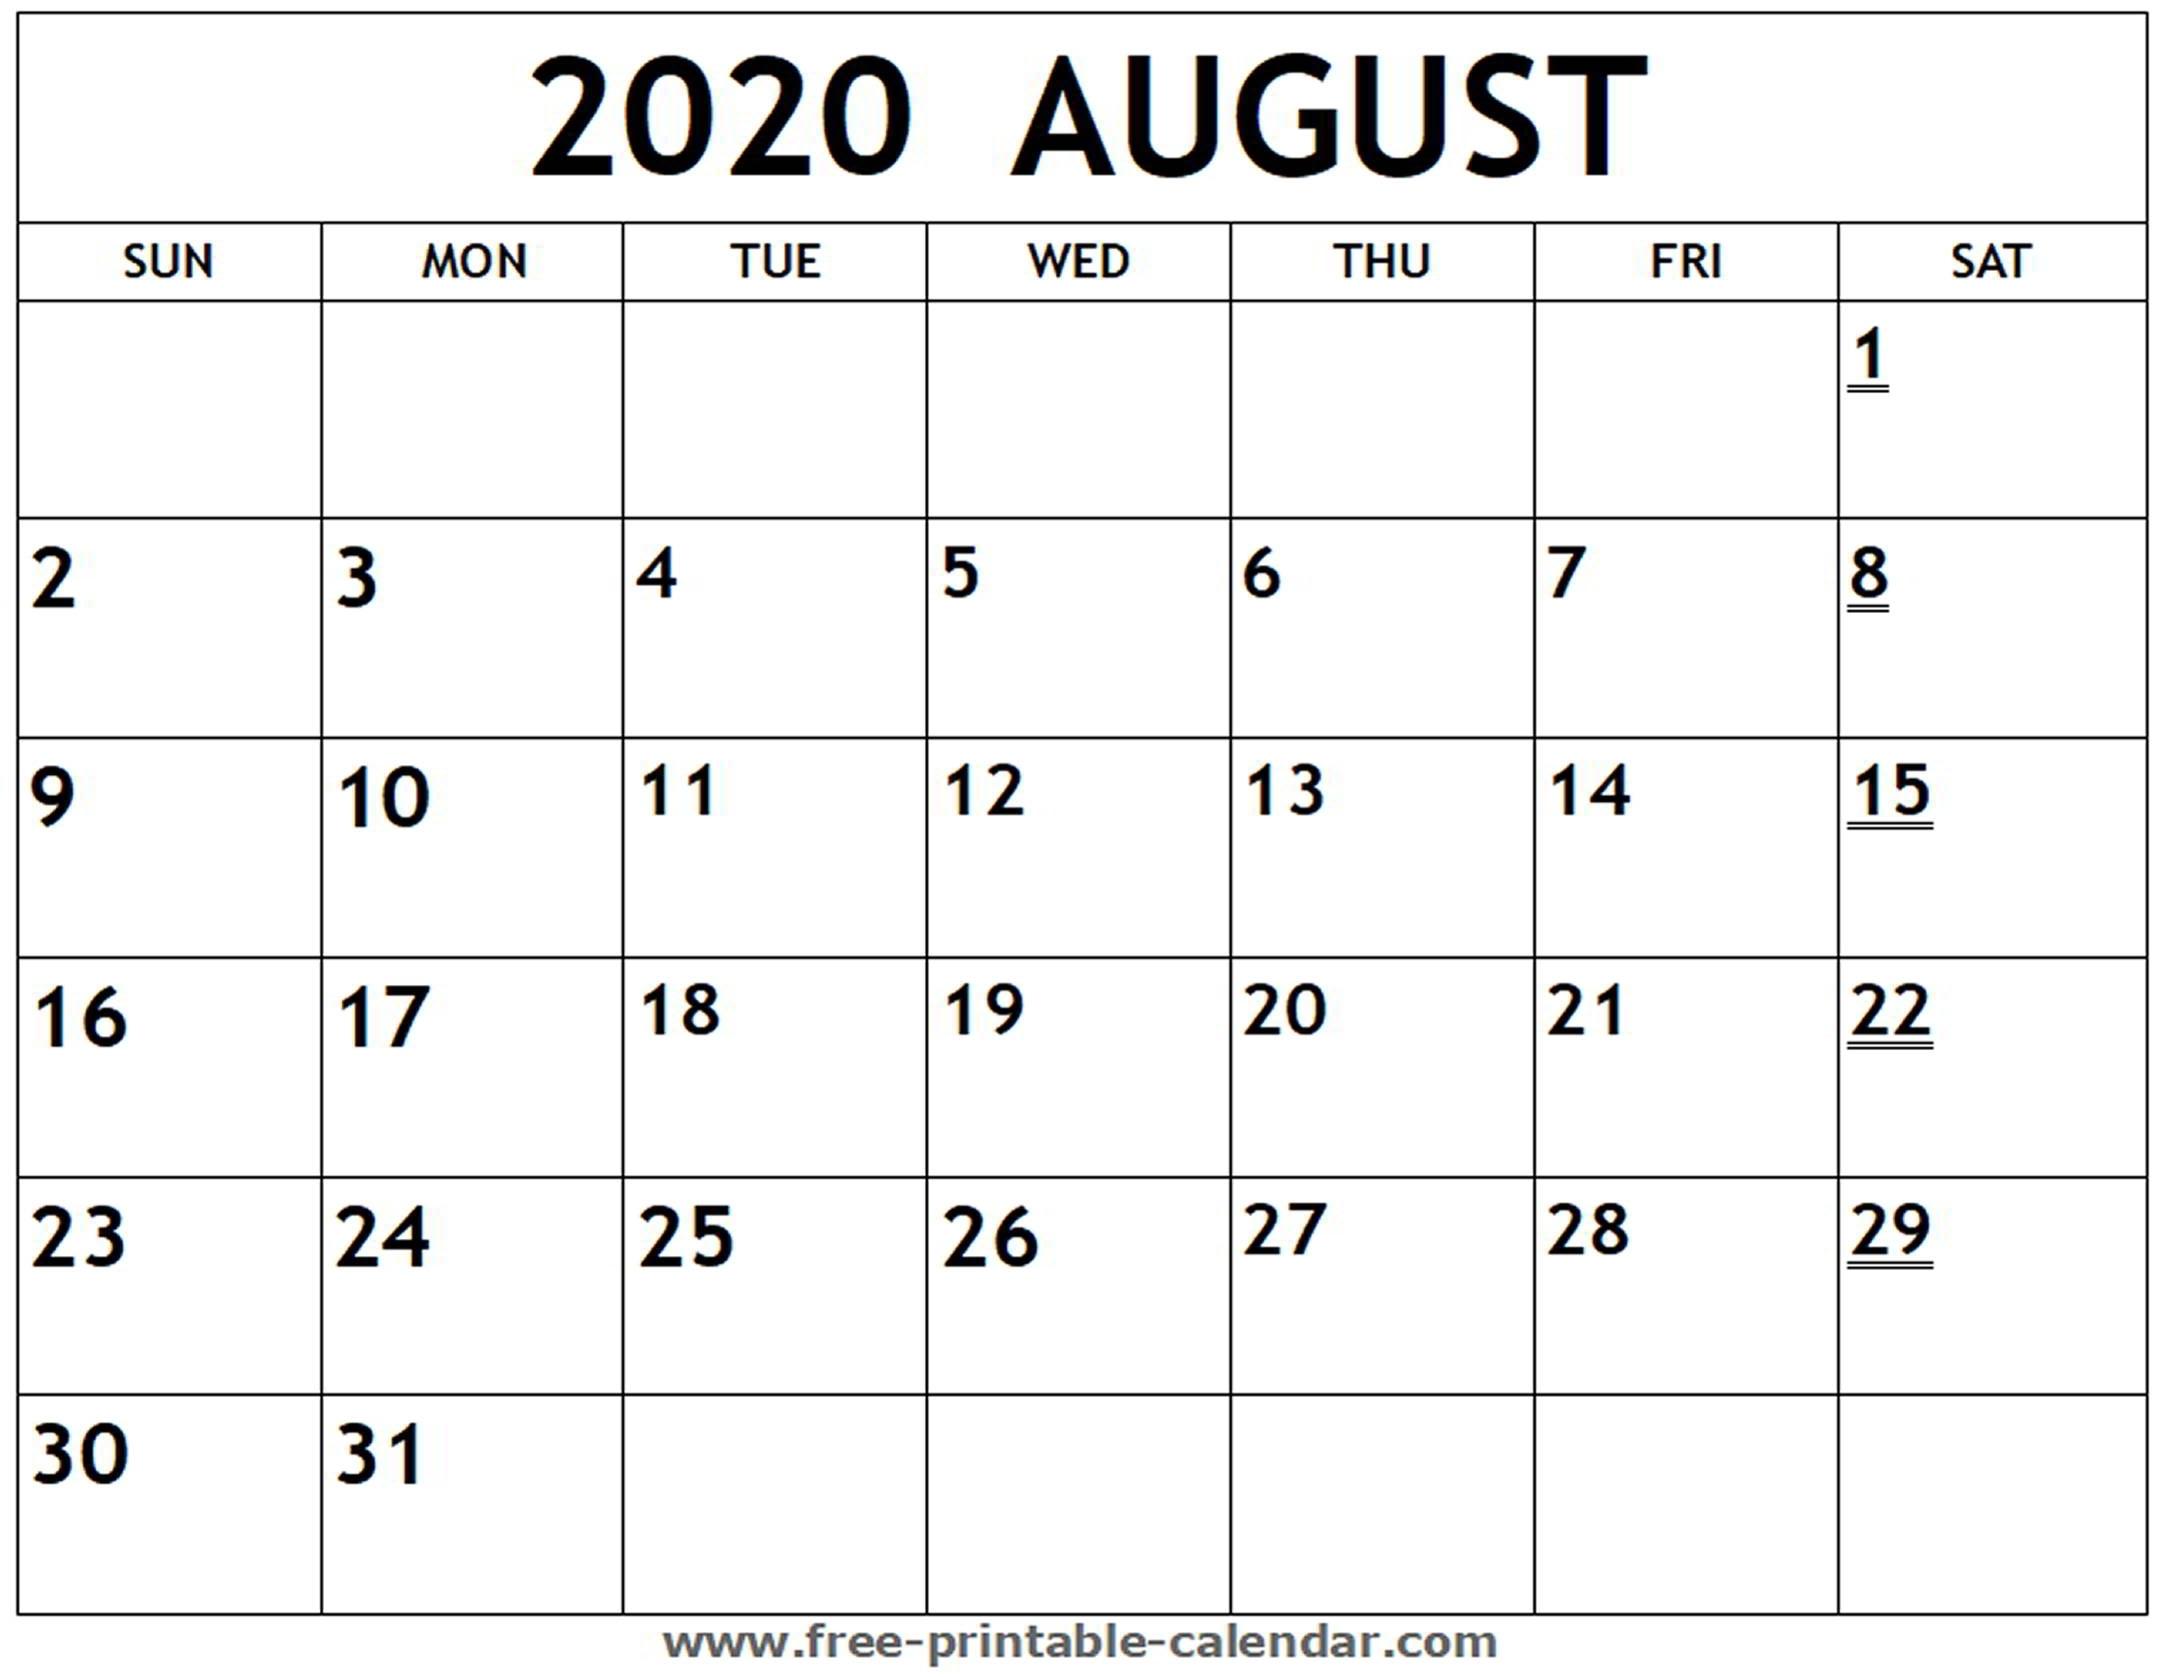 Printable 2020 August Calendar - Free-Printable-Calendar intended for Printable Fill In Calendar 2020